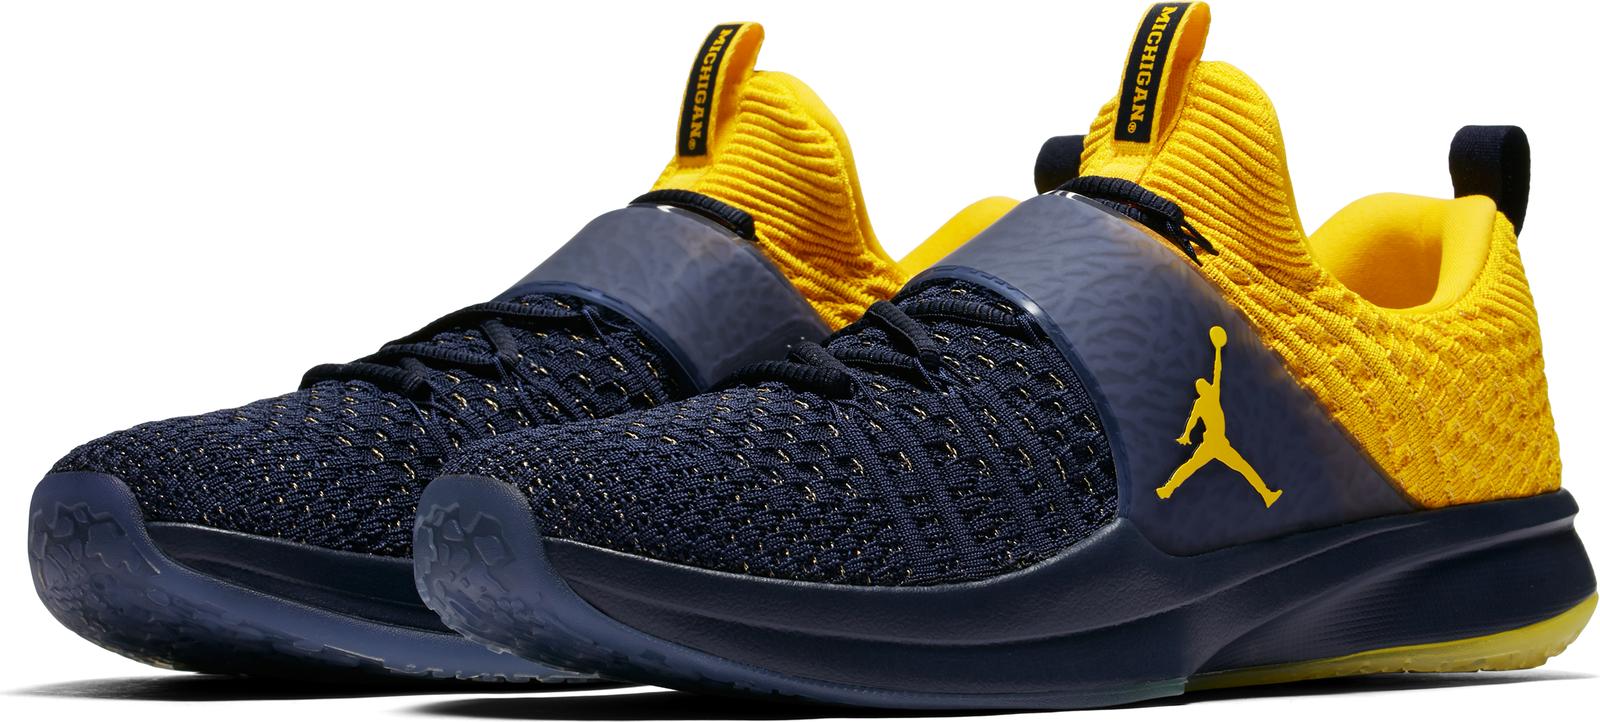 University Of Michigan Running Shoes